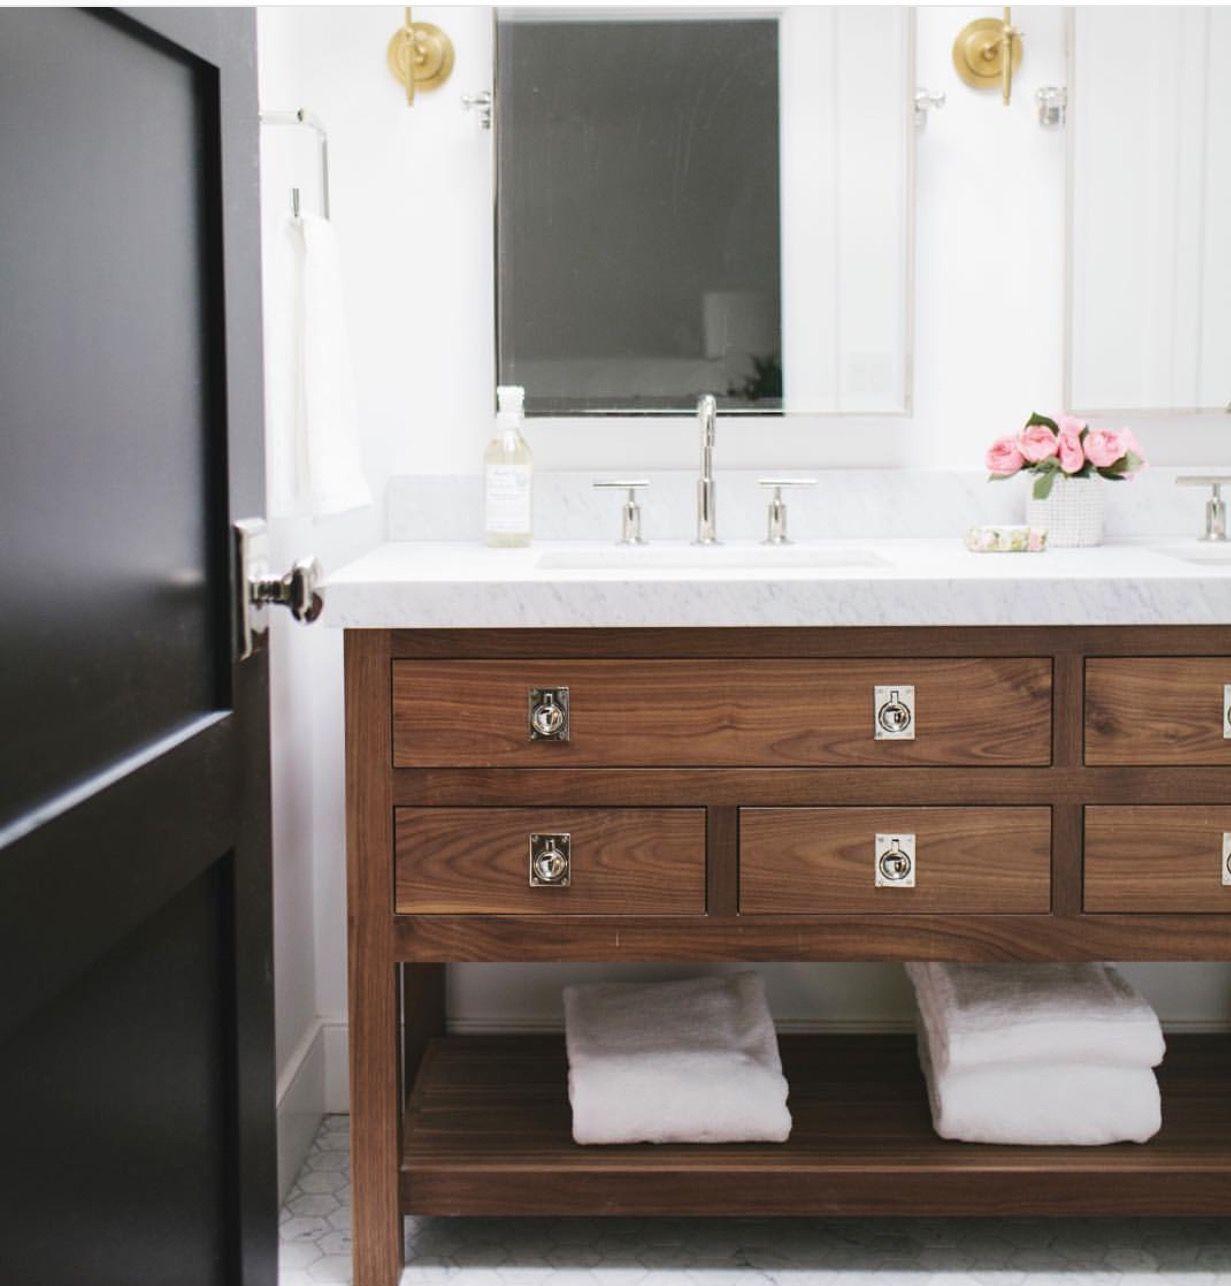 Pin By Stephanie Gleeson On Toiletd: Pin By Stephanie Barnes On House & Home